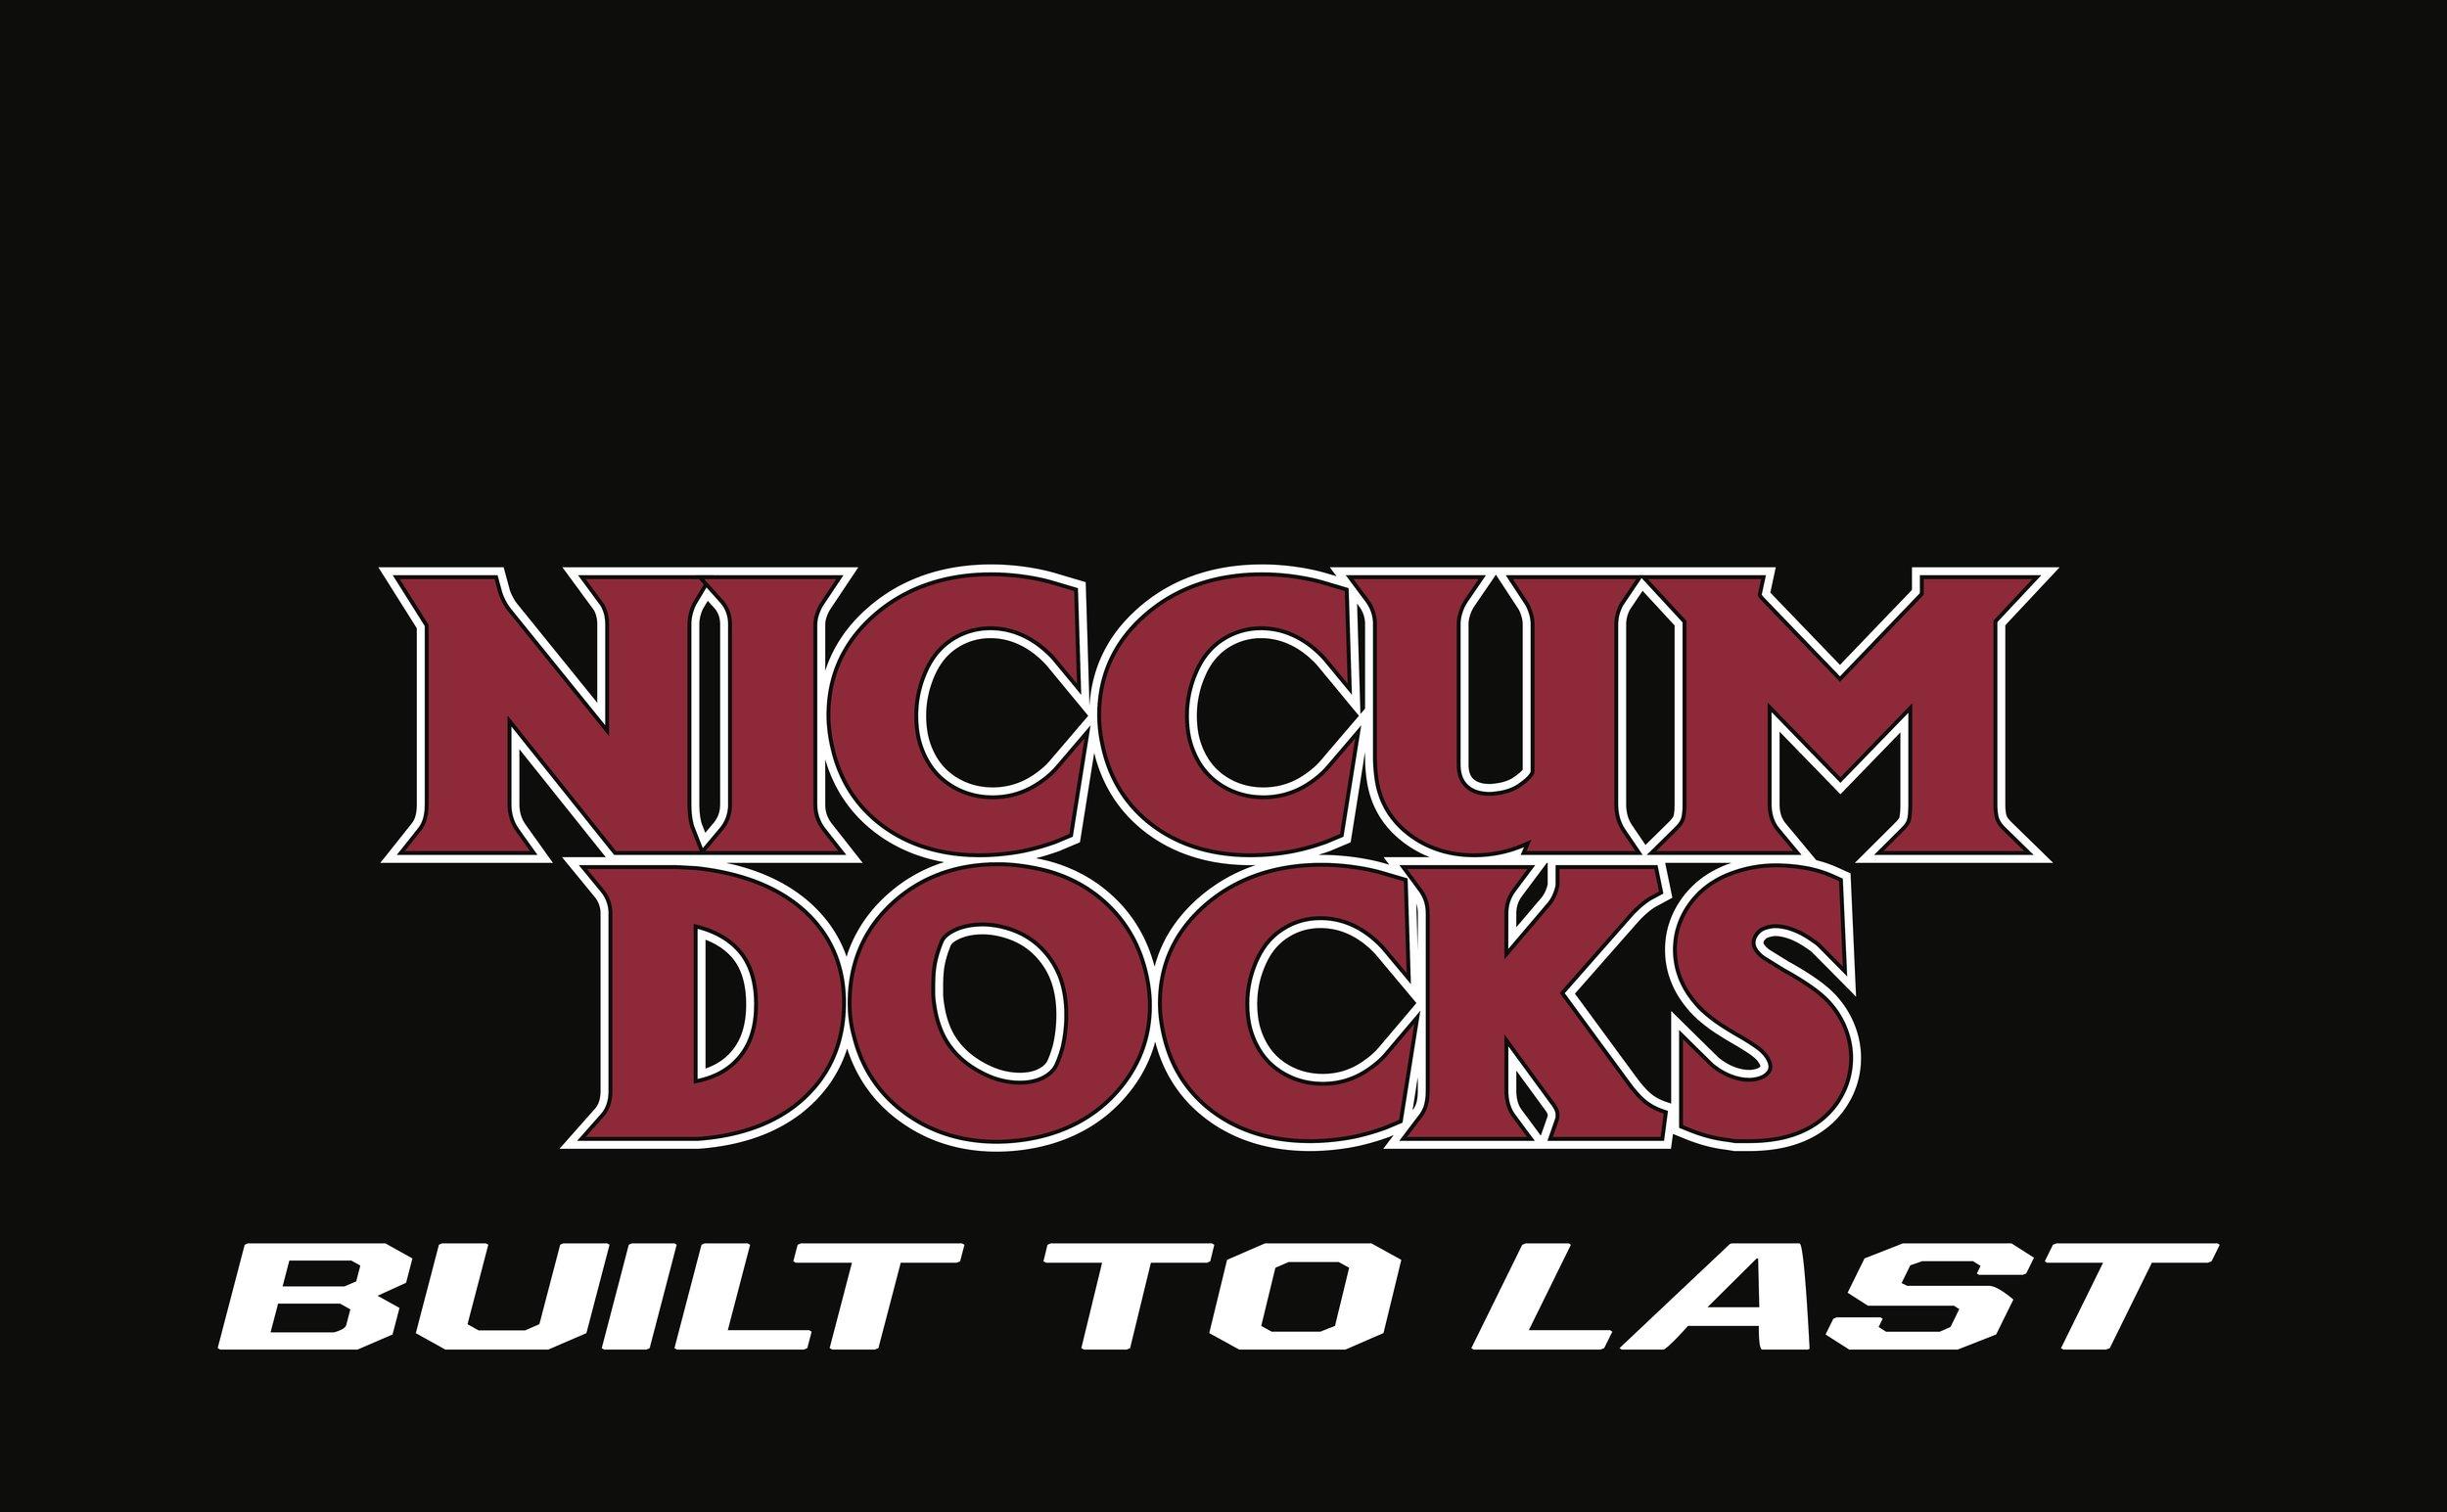 niccum docks 2 NEW-2.jpg